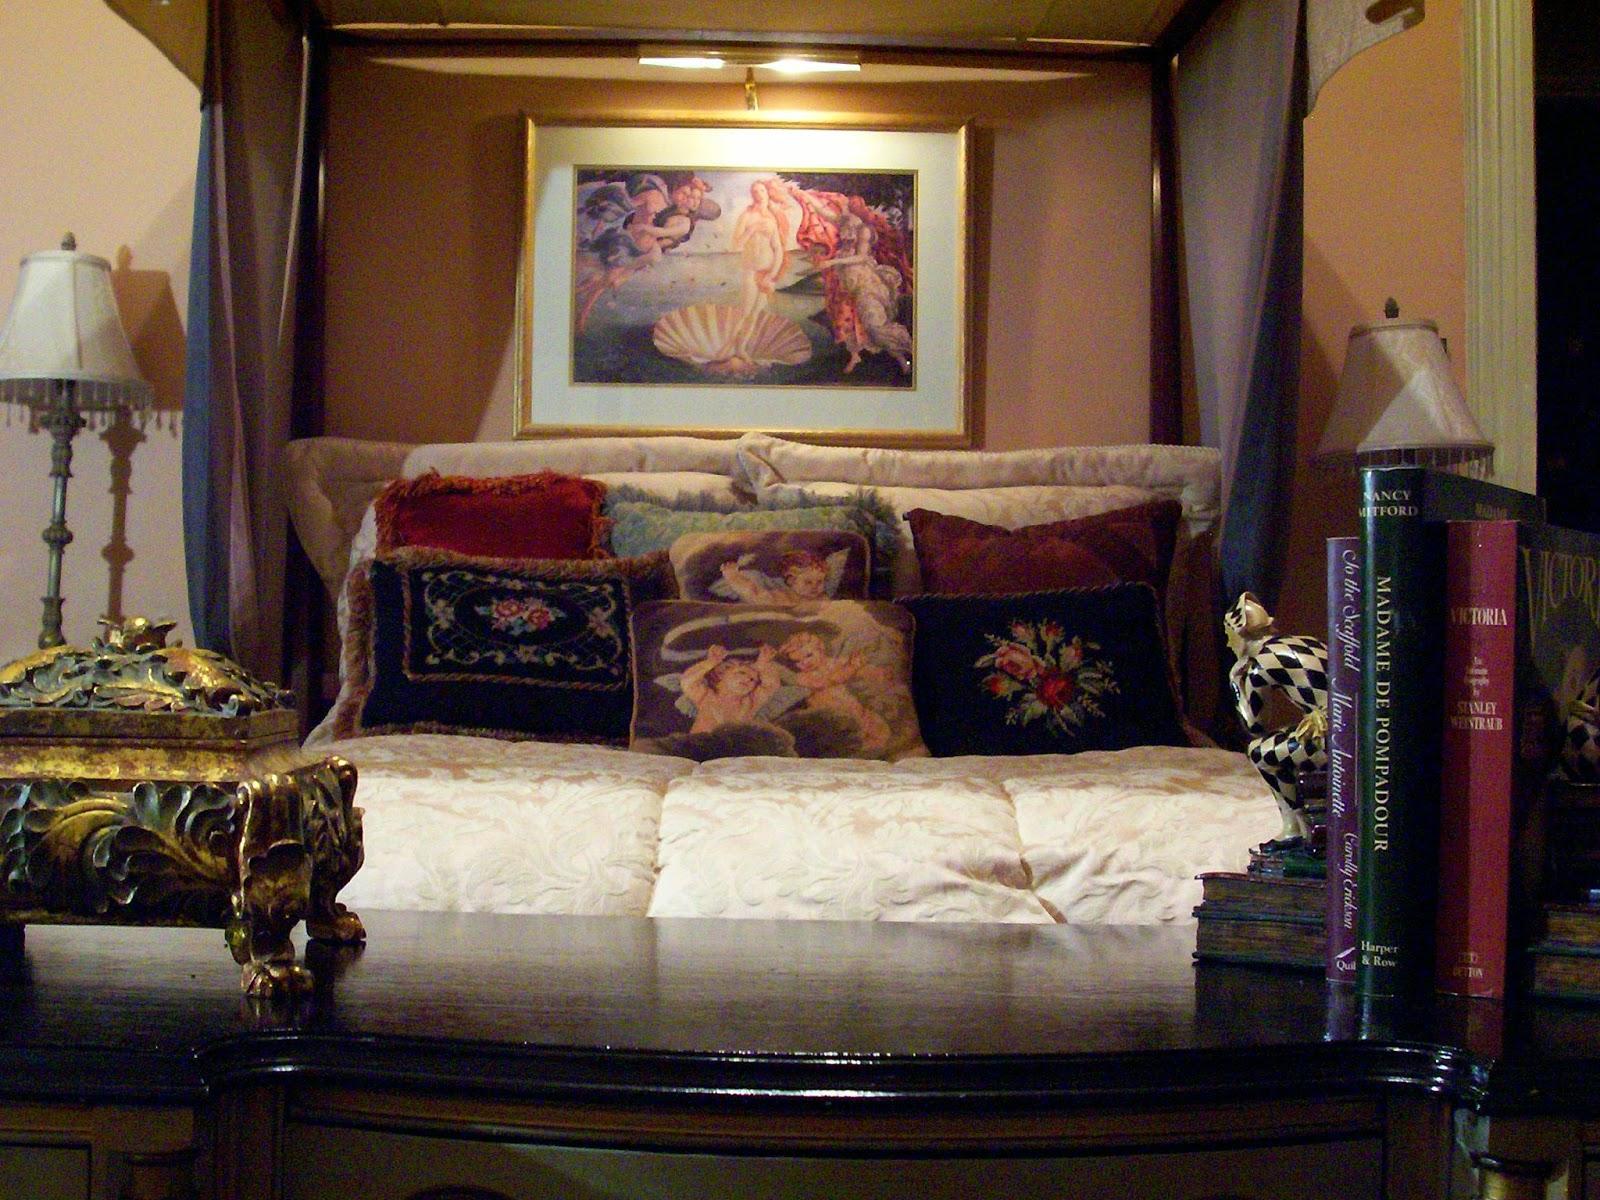 Terra Cotta Bedroom In My Circa 1900 Home title=